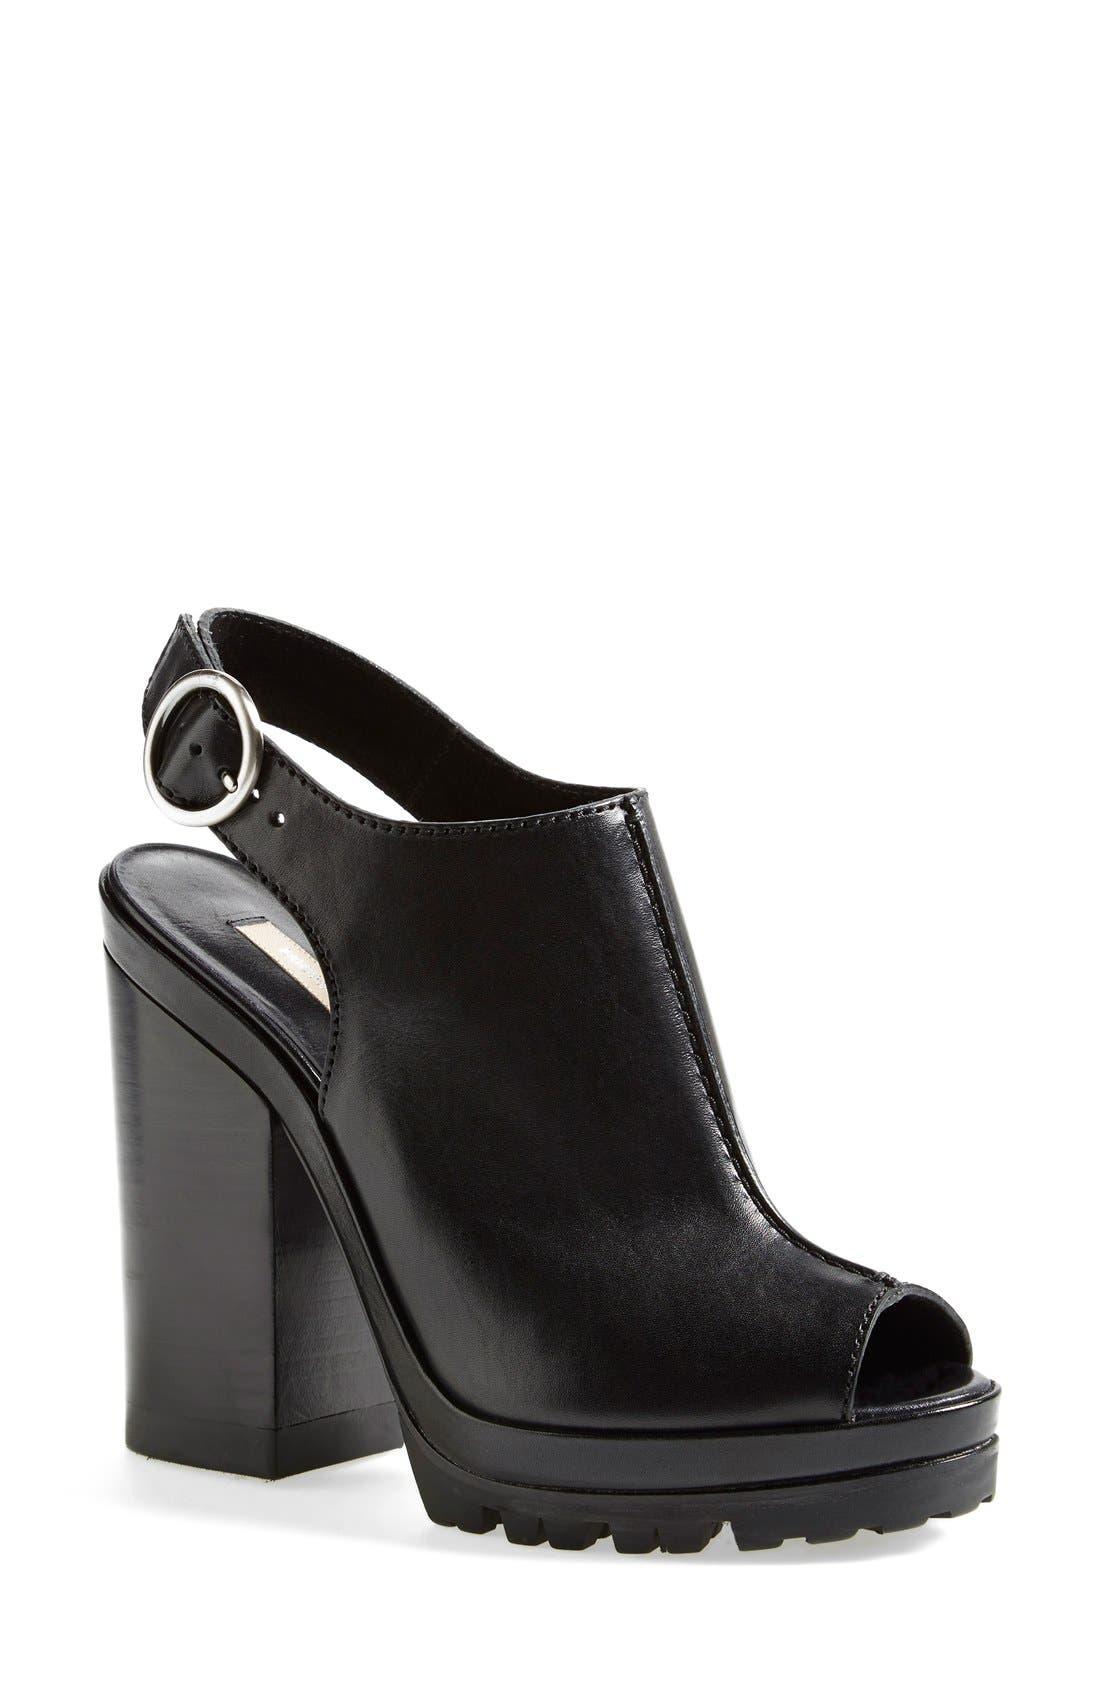 Main Image - Michael Kors 'Patras' Sandal (Women)